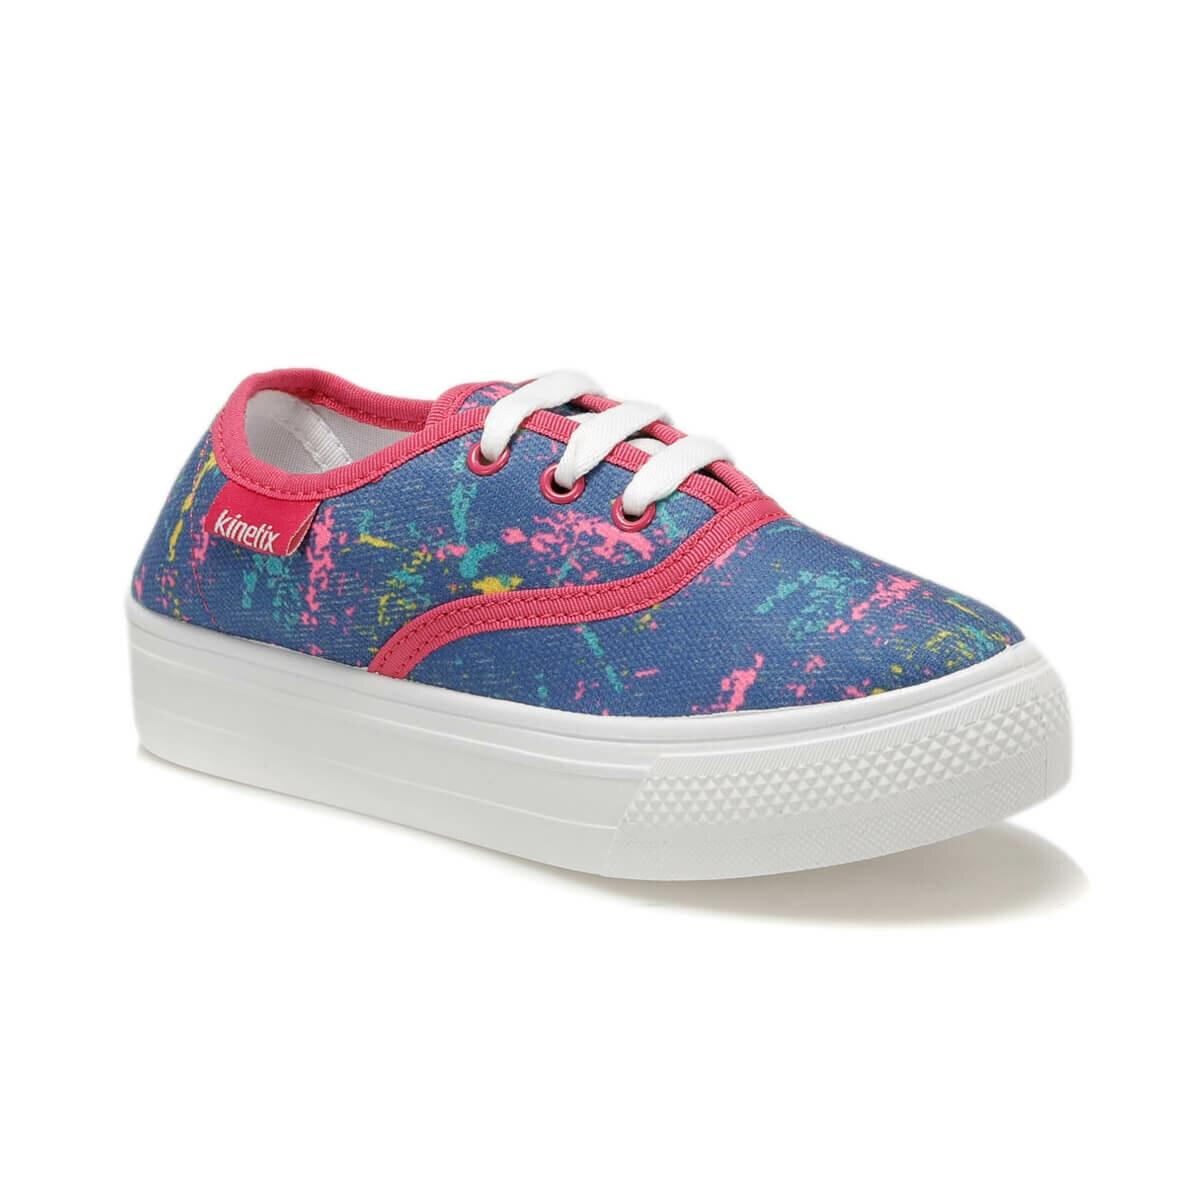 FLO MOSSE Blue Girl Children Sneaker Shoes KINETIX